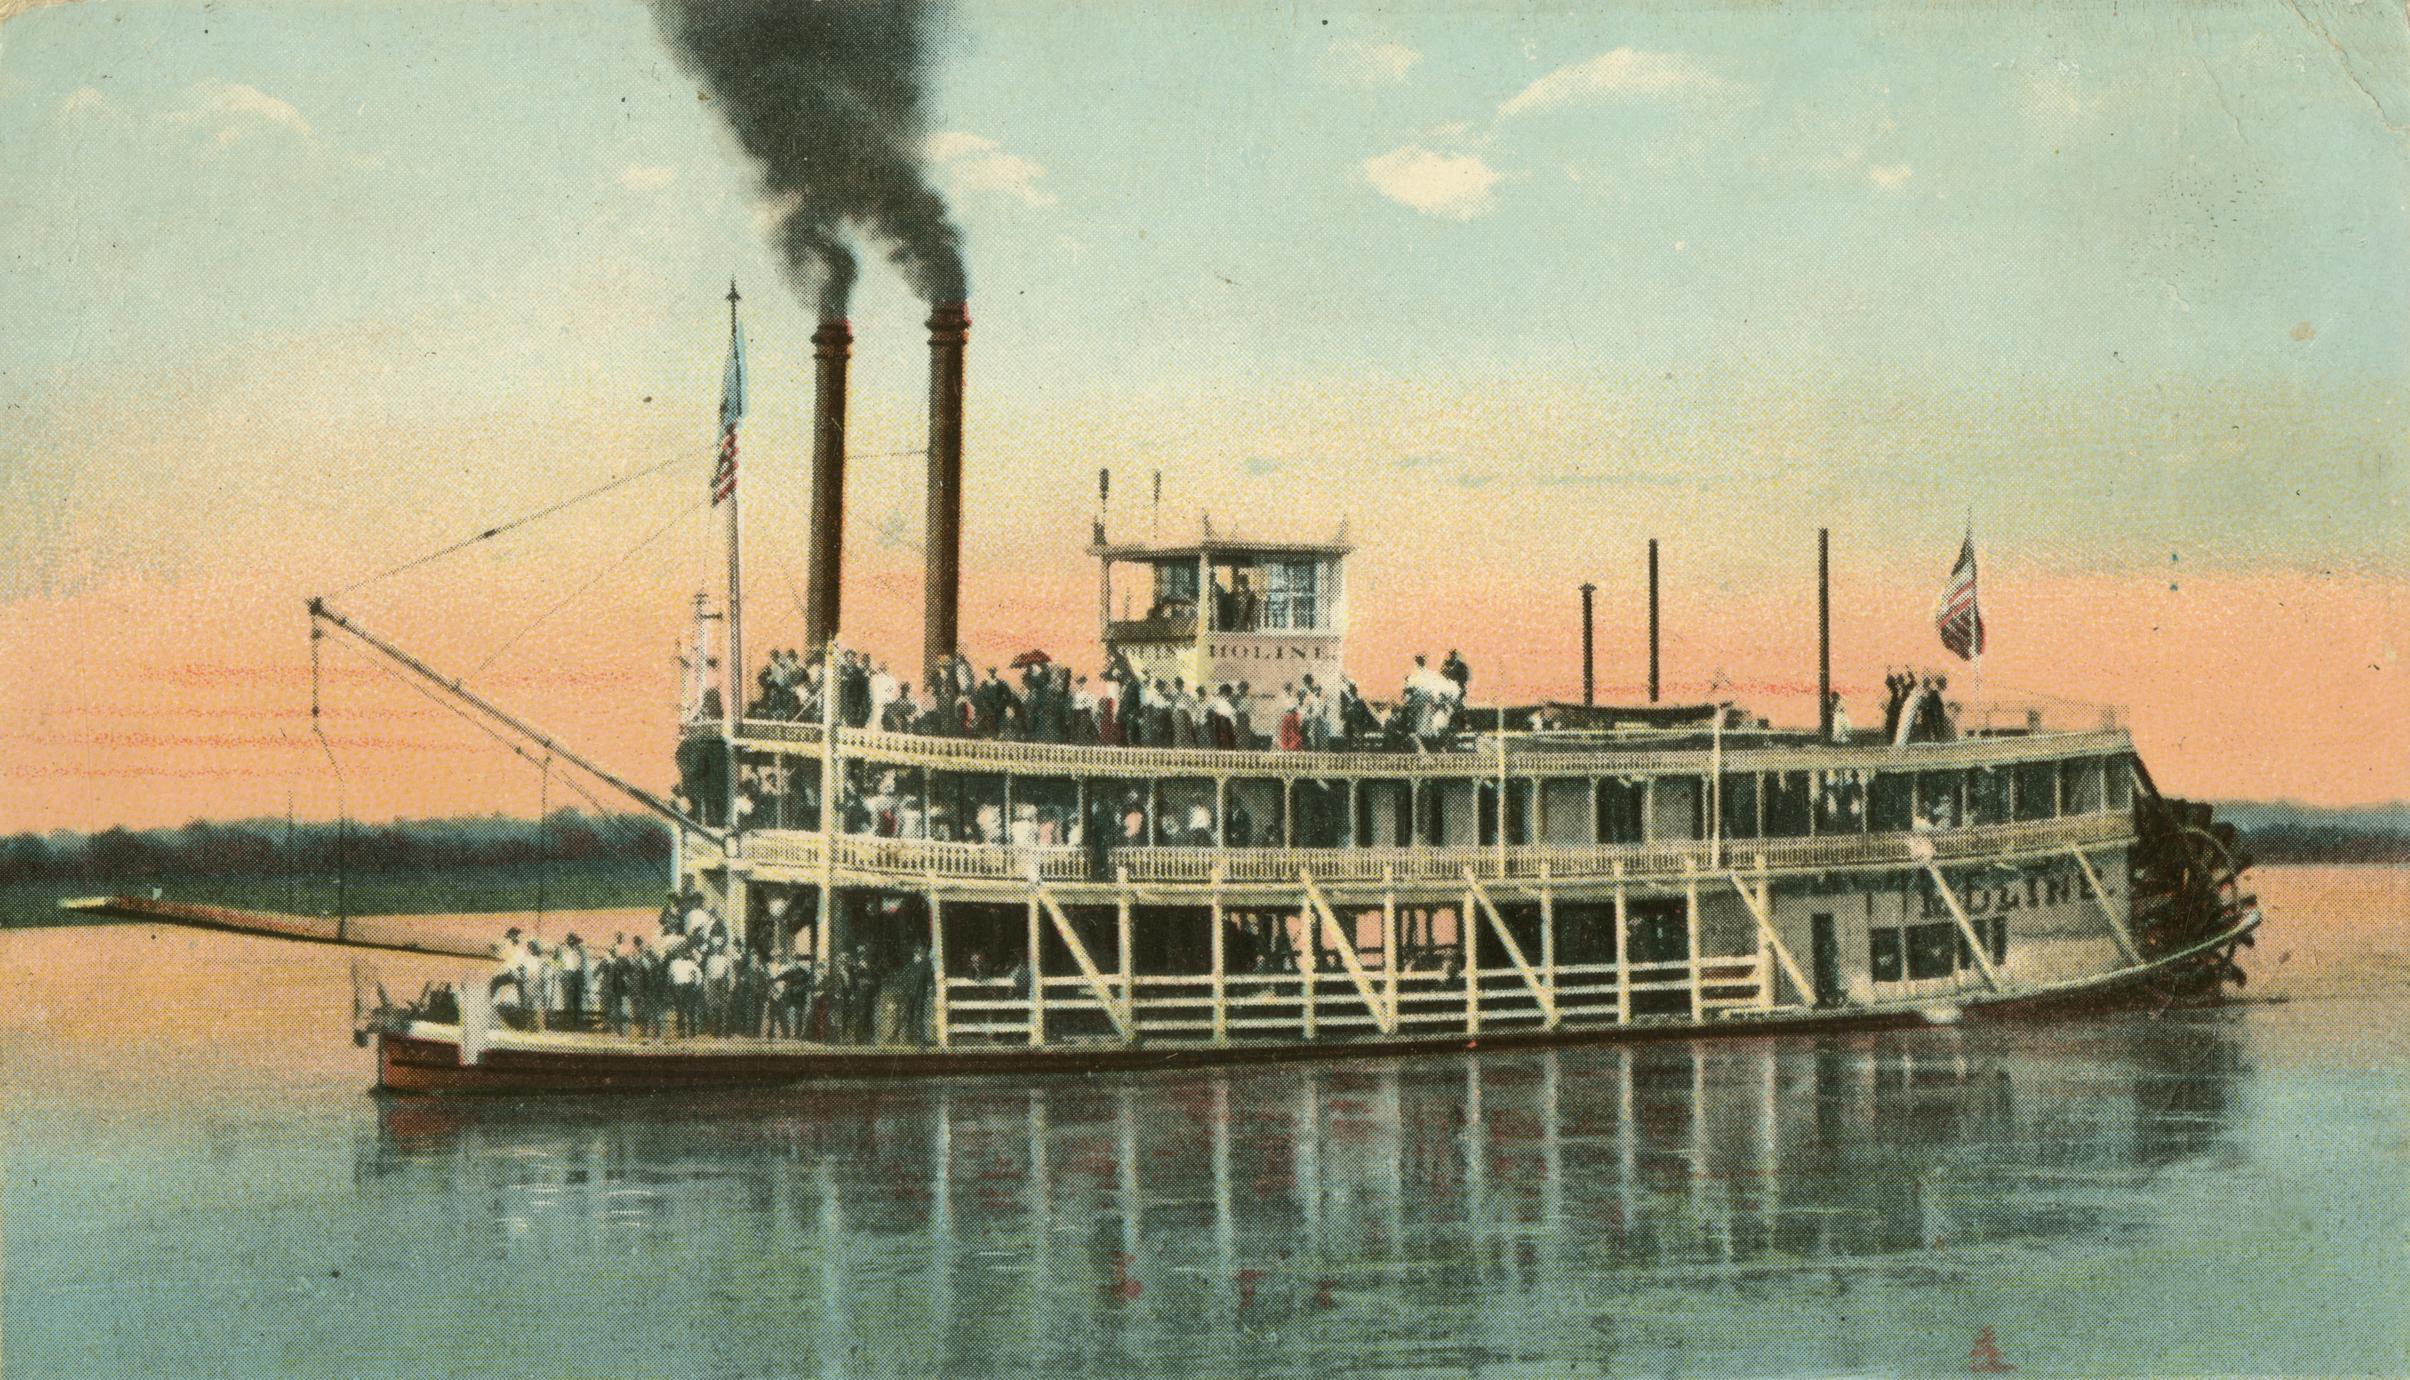 Moline (Rafter/Excursion, 1880-1908)